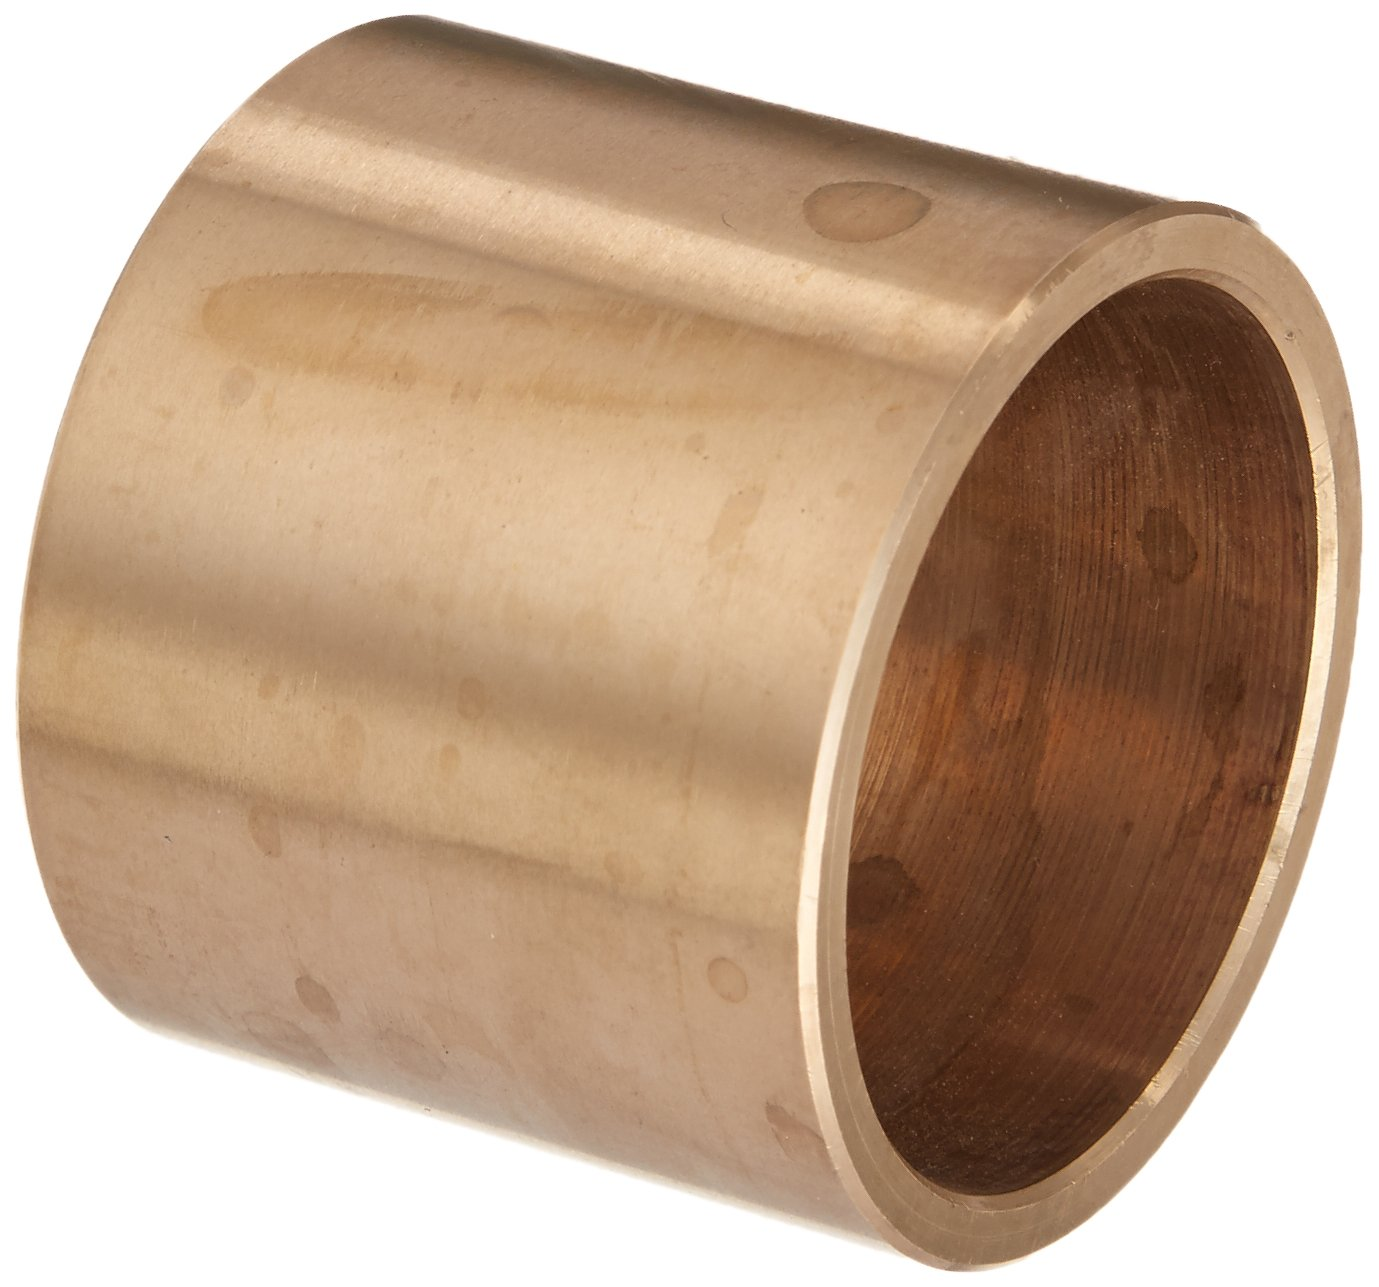 Oil Impregnated 1 1//8 Nom SAE 841 Bronze Bunting Bearings O.D. I.D. 3//4 Lg. 1 Each 7//8 Nom